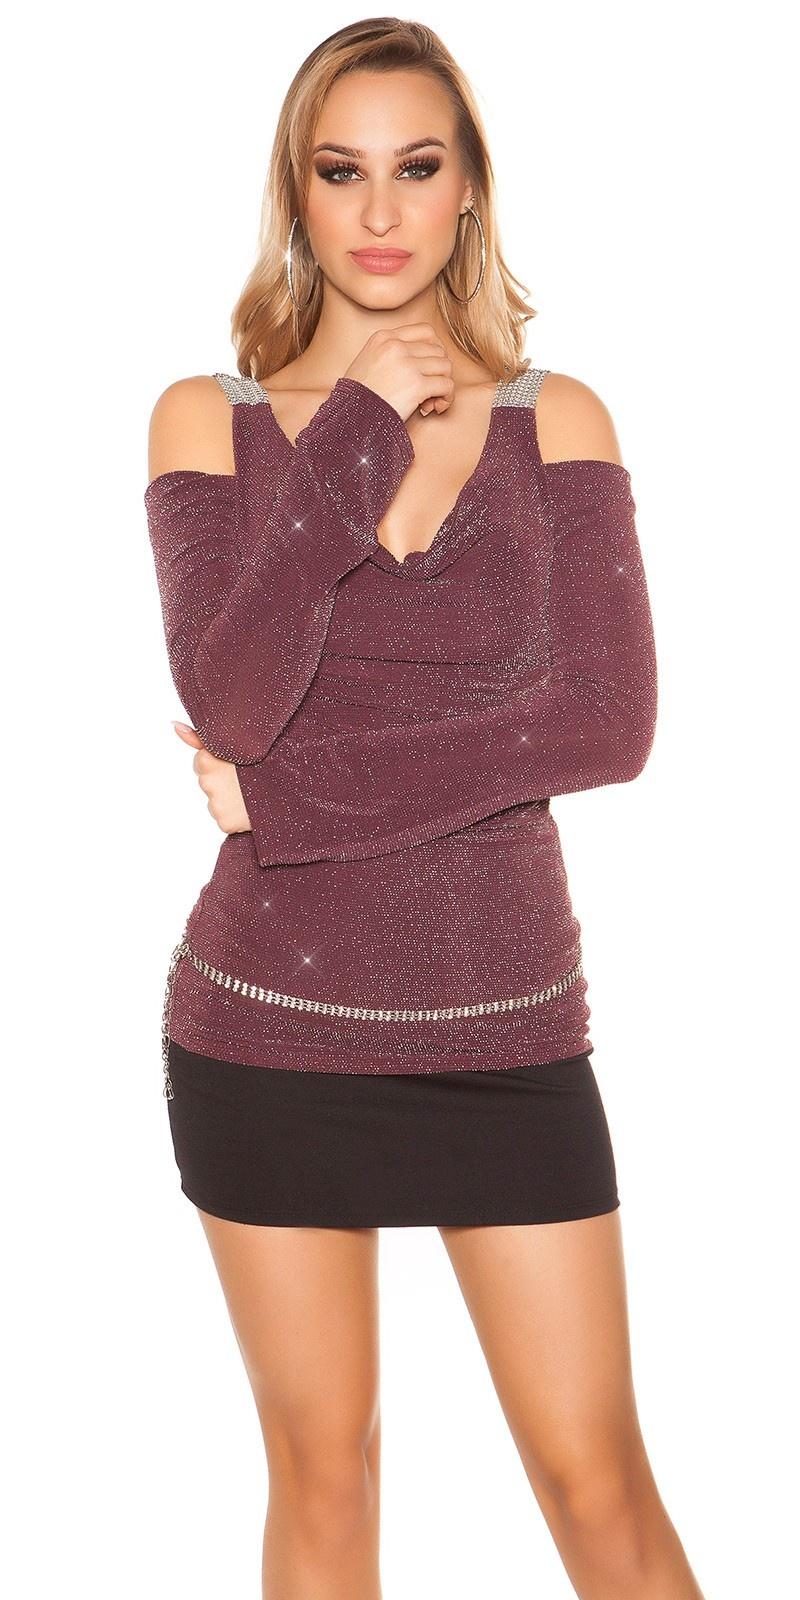 Sexy KouCla Partyshirt shoulder free Violet